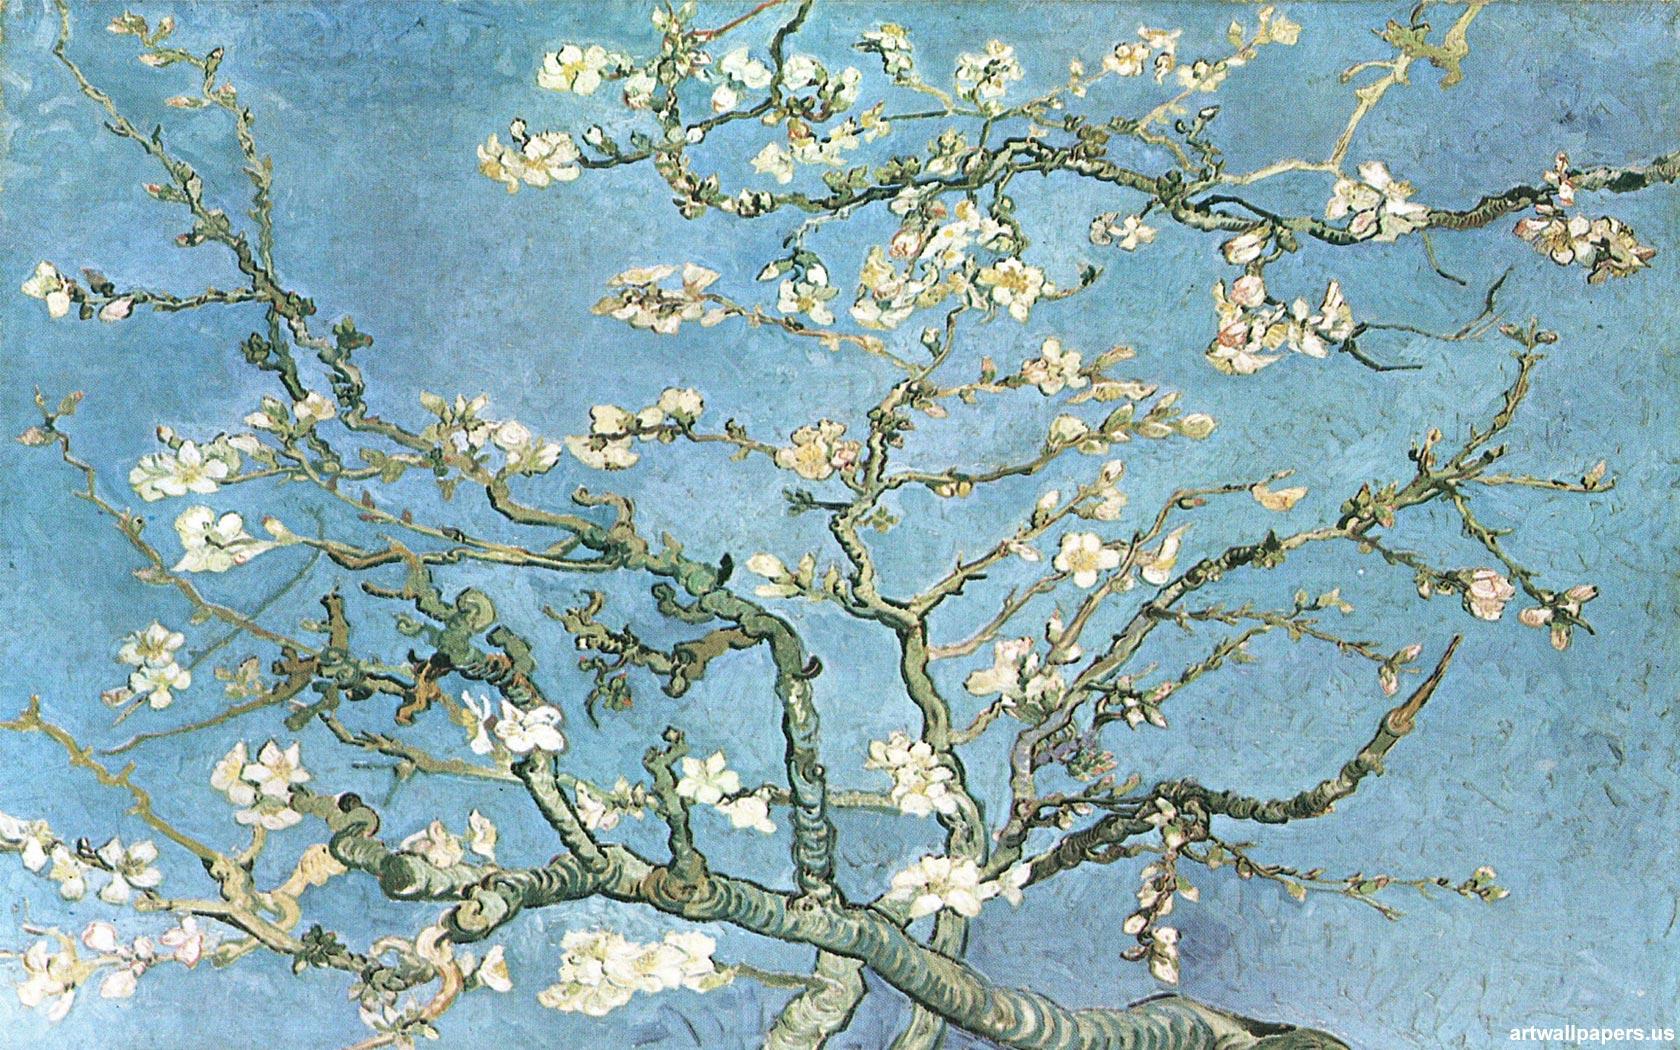 Vincent van Gogh Painting Wallpapers Art Wallpapers Full HD 1680x1050